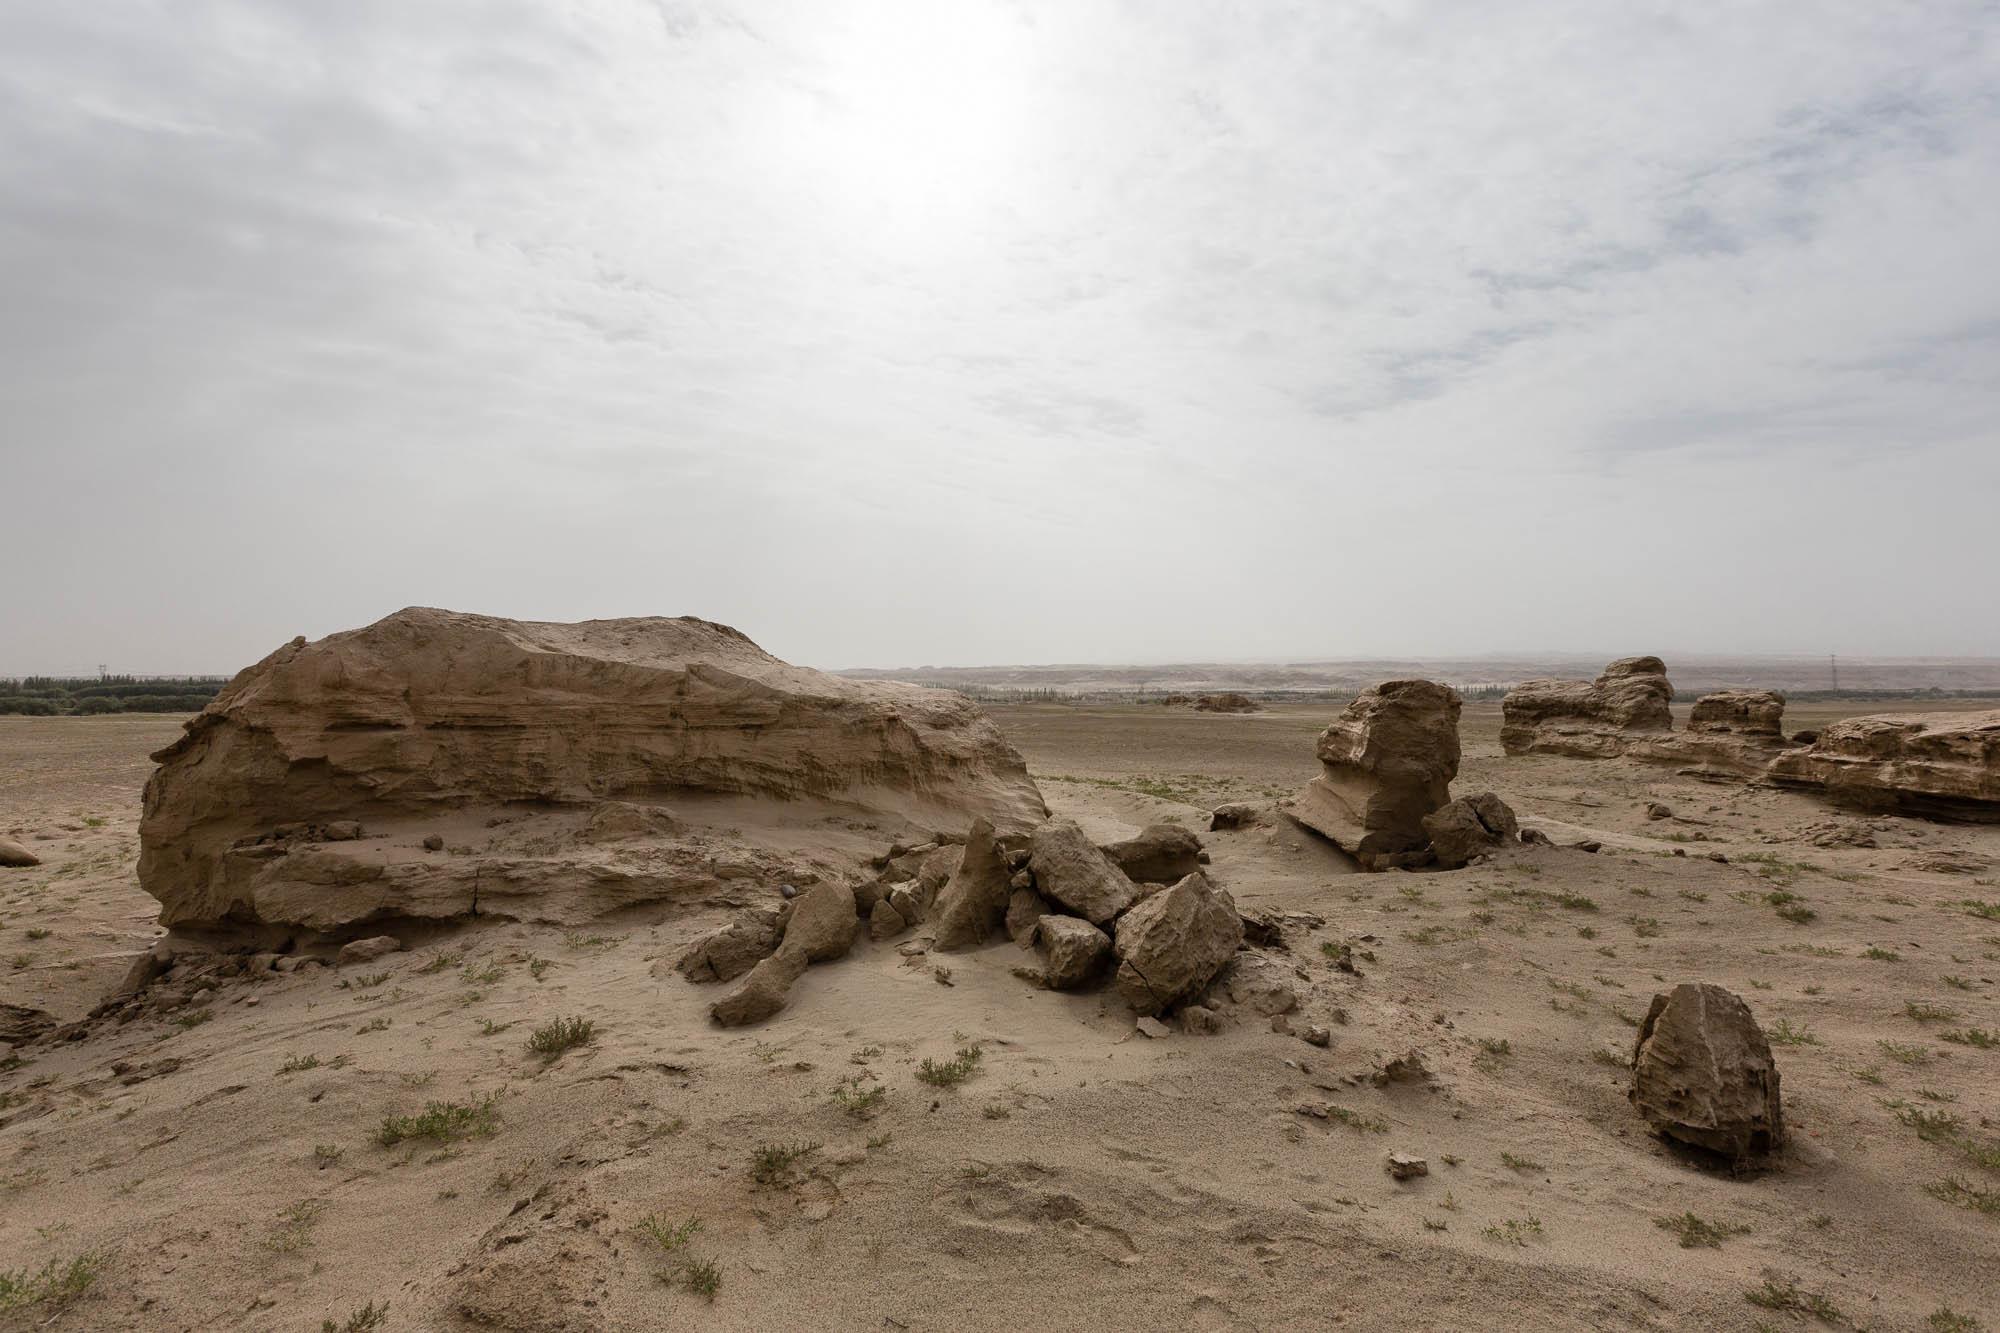 Melikawat ruins